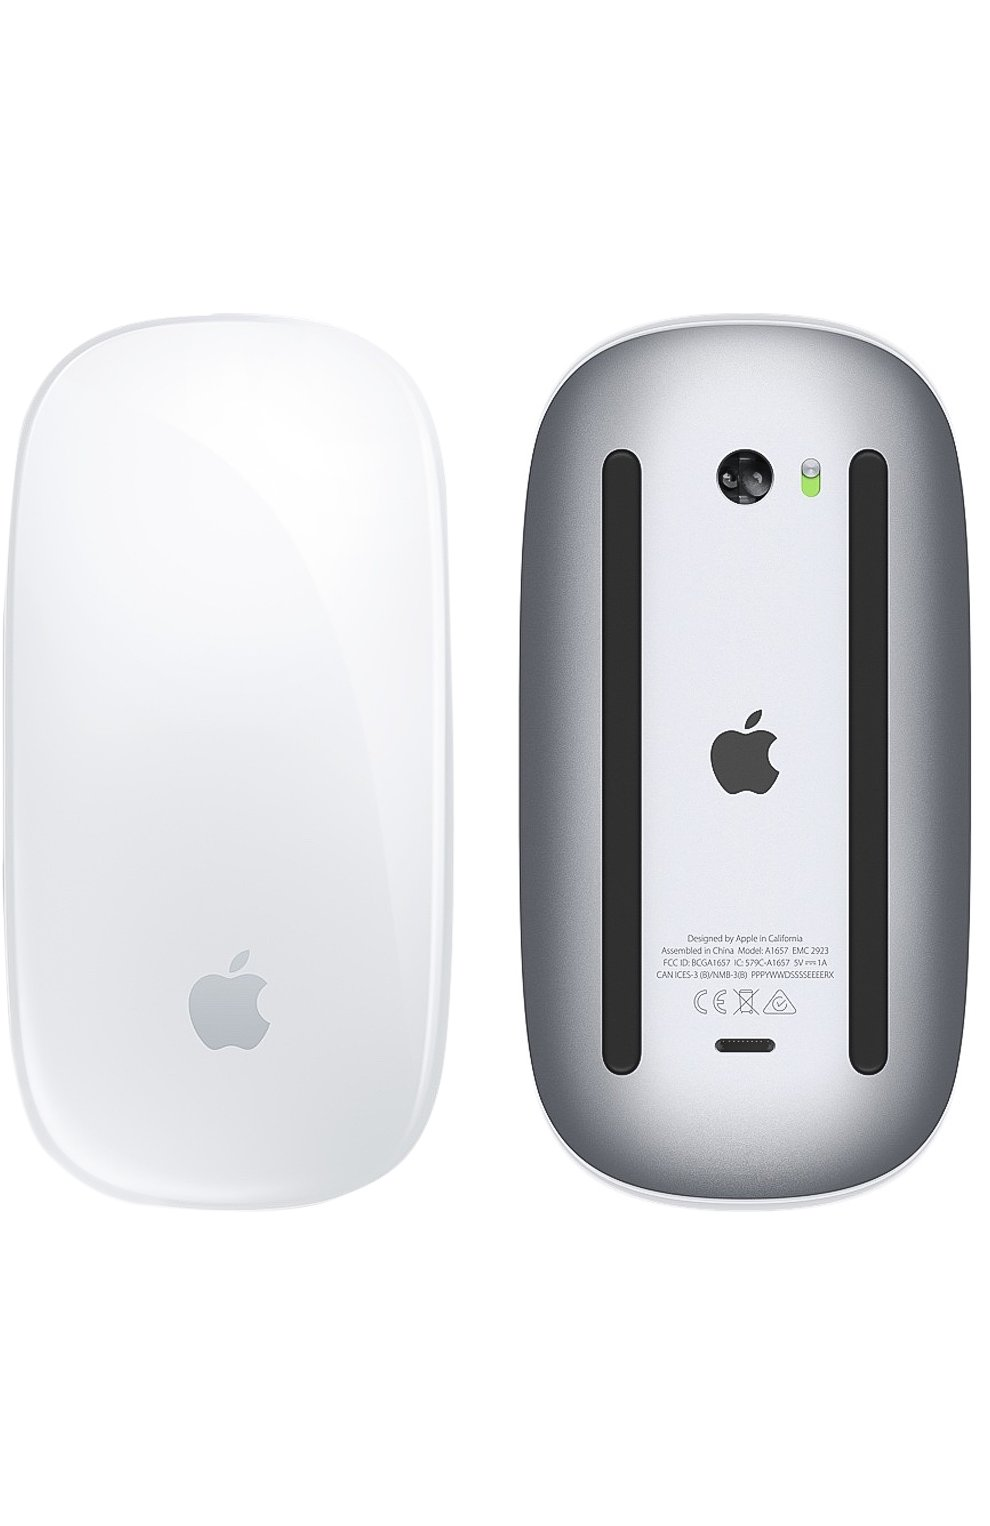 Мышь Apple Magic Mouse 2 | Фото №2